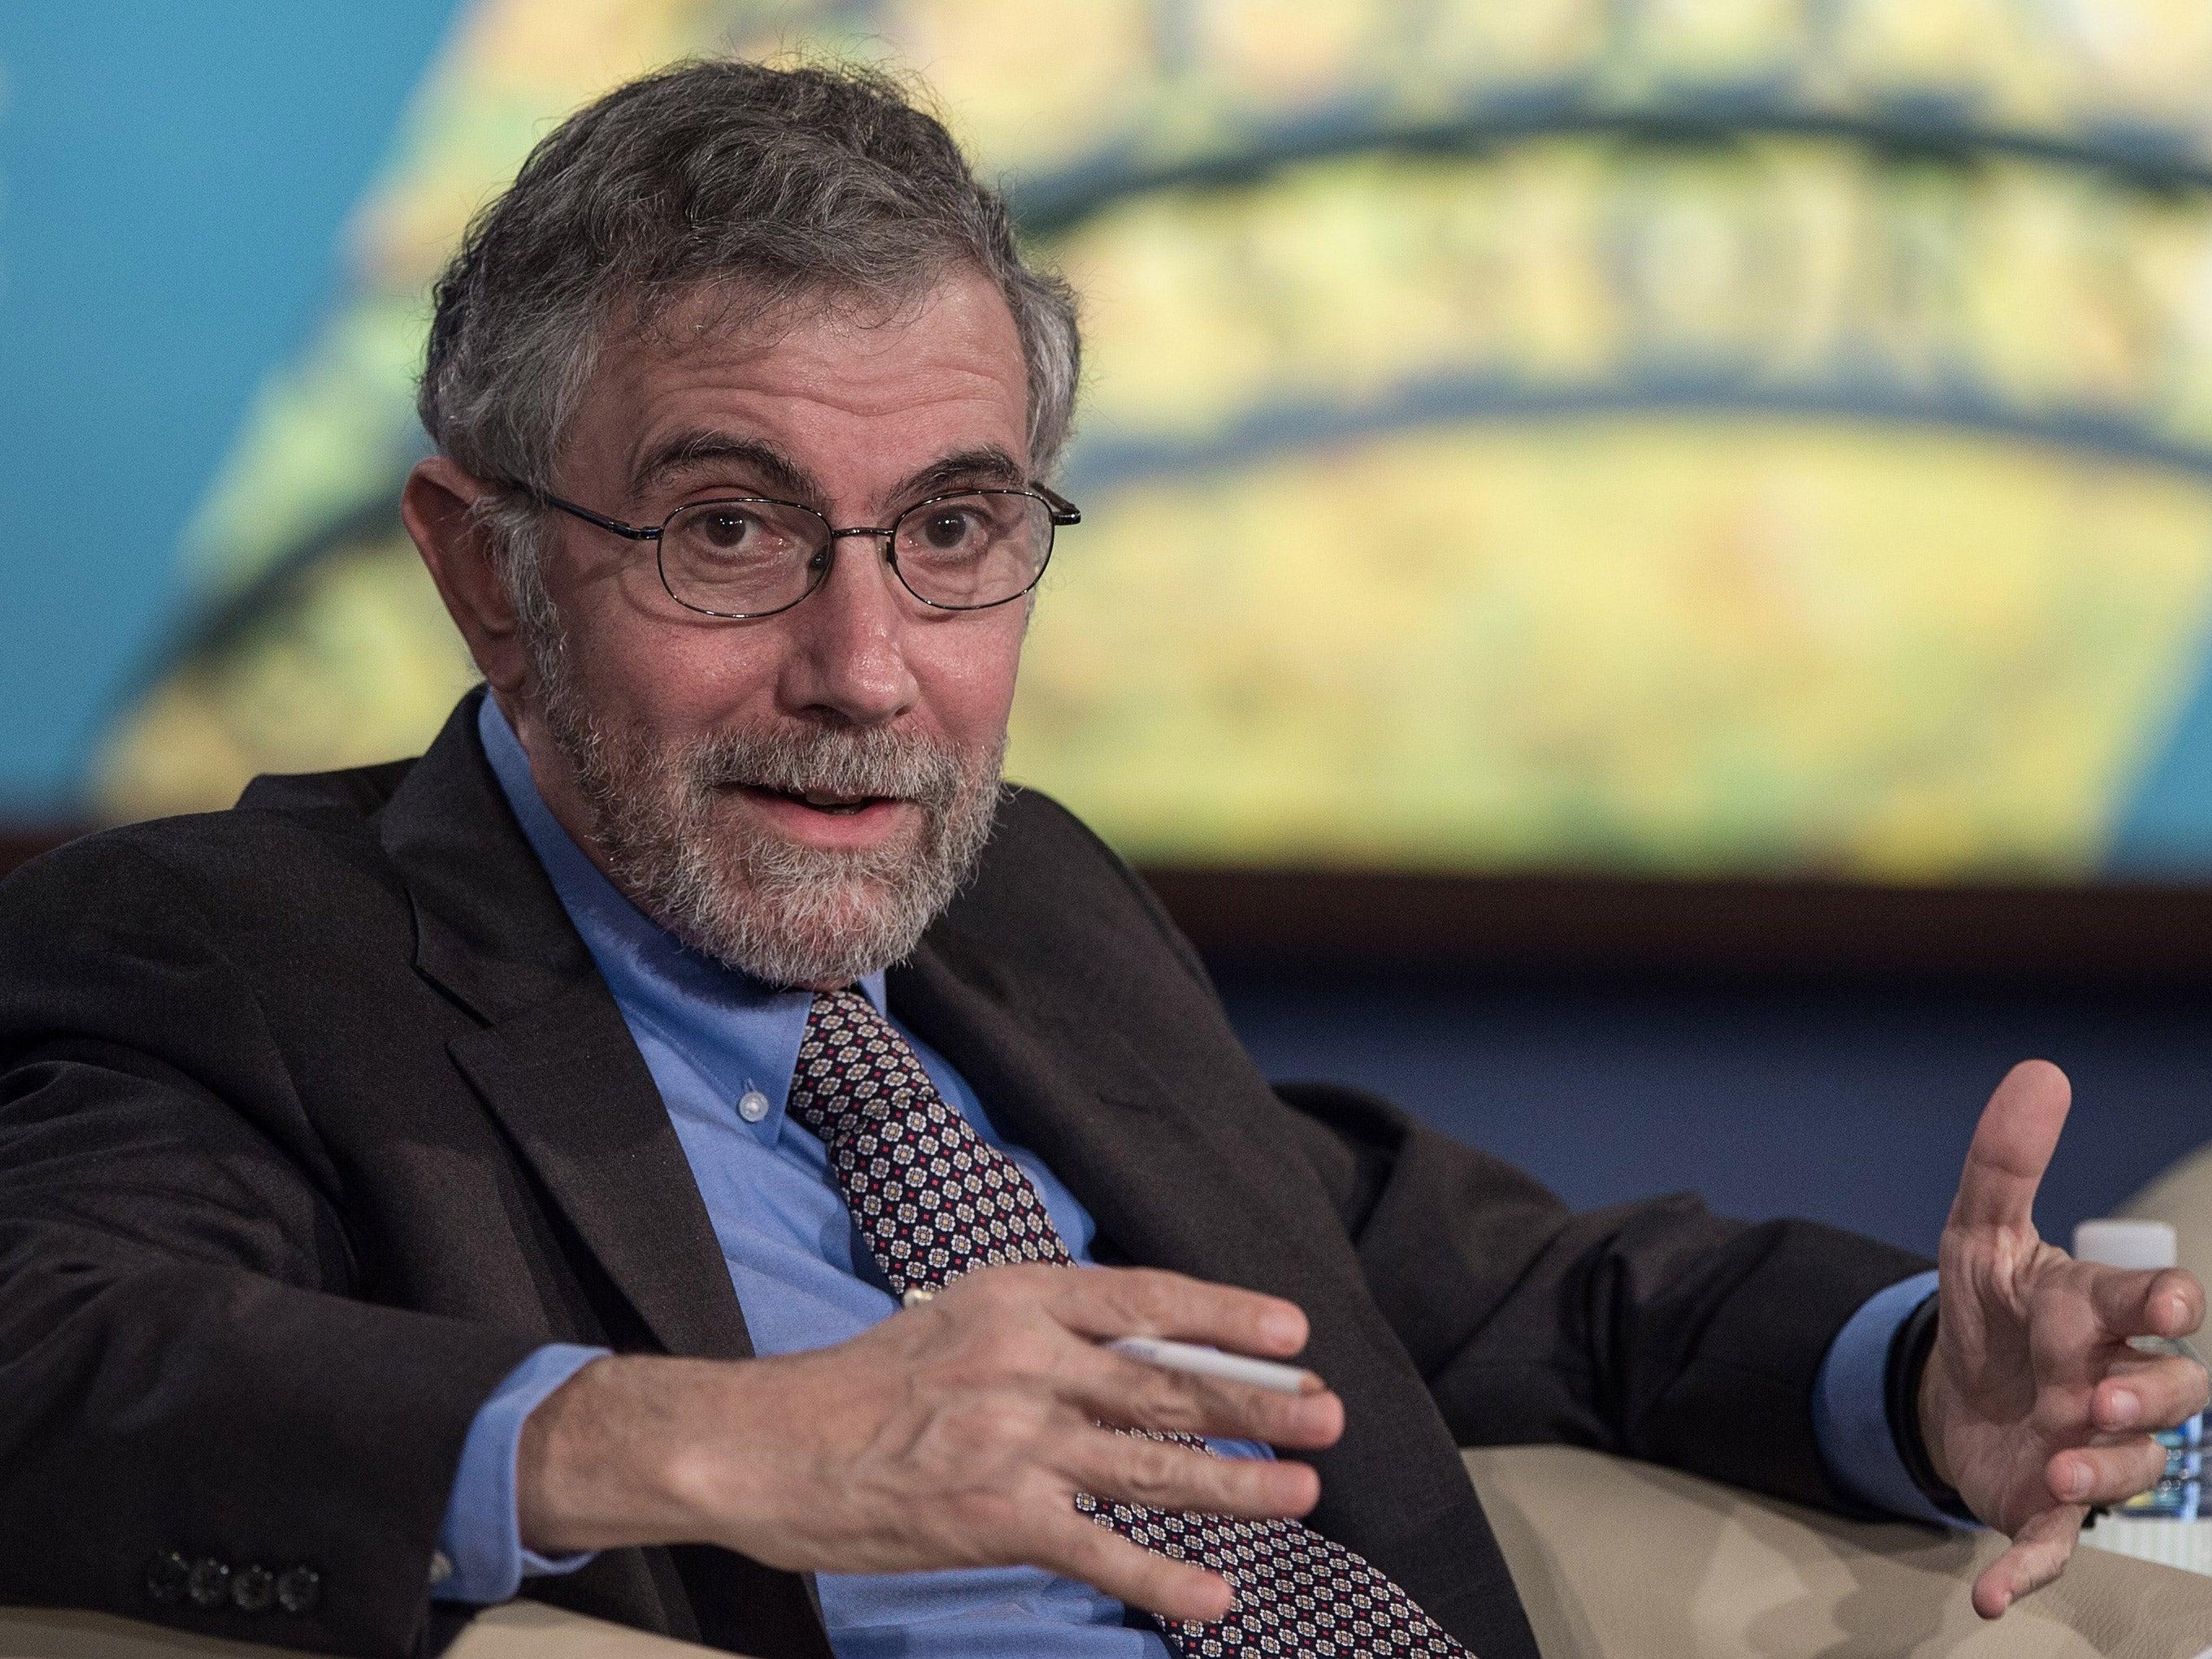 Paul Krugman says 'zero chance' leaving EU will make UK better off